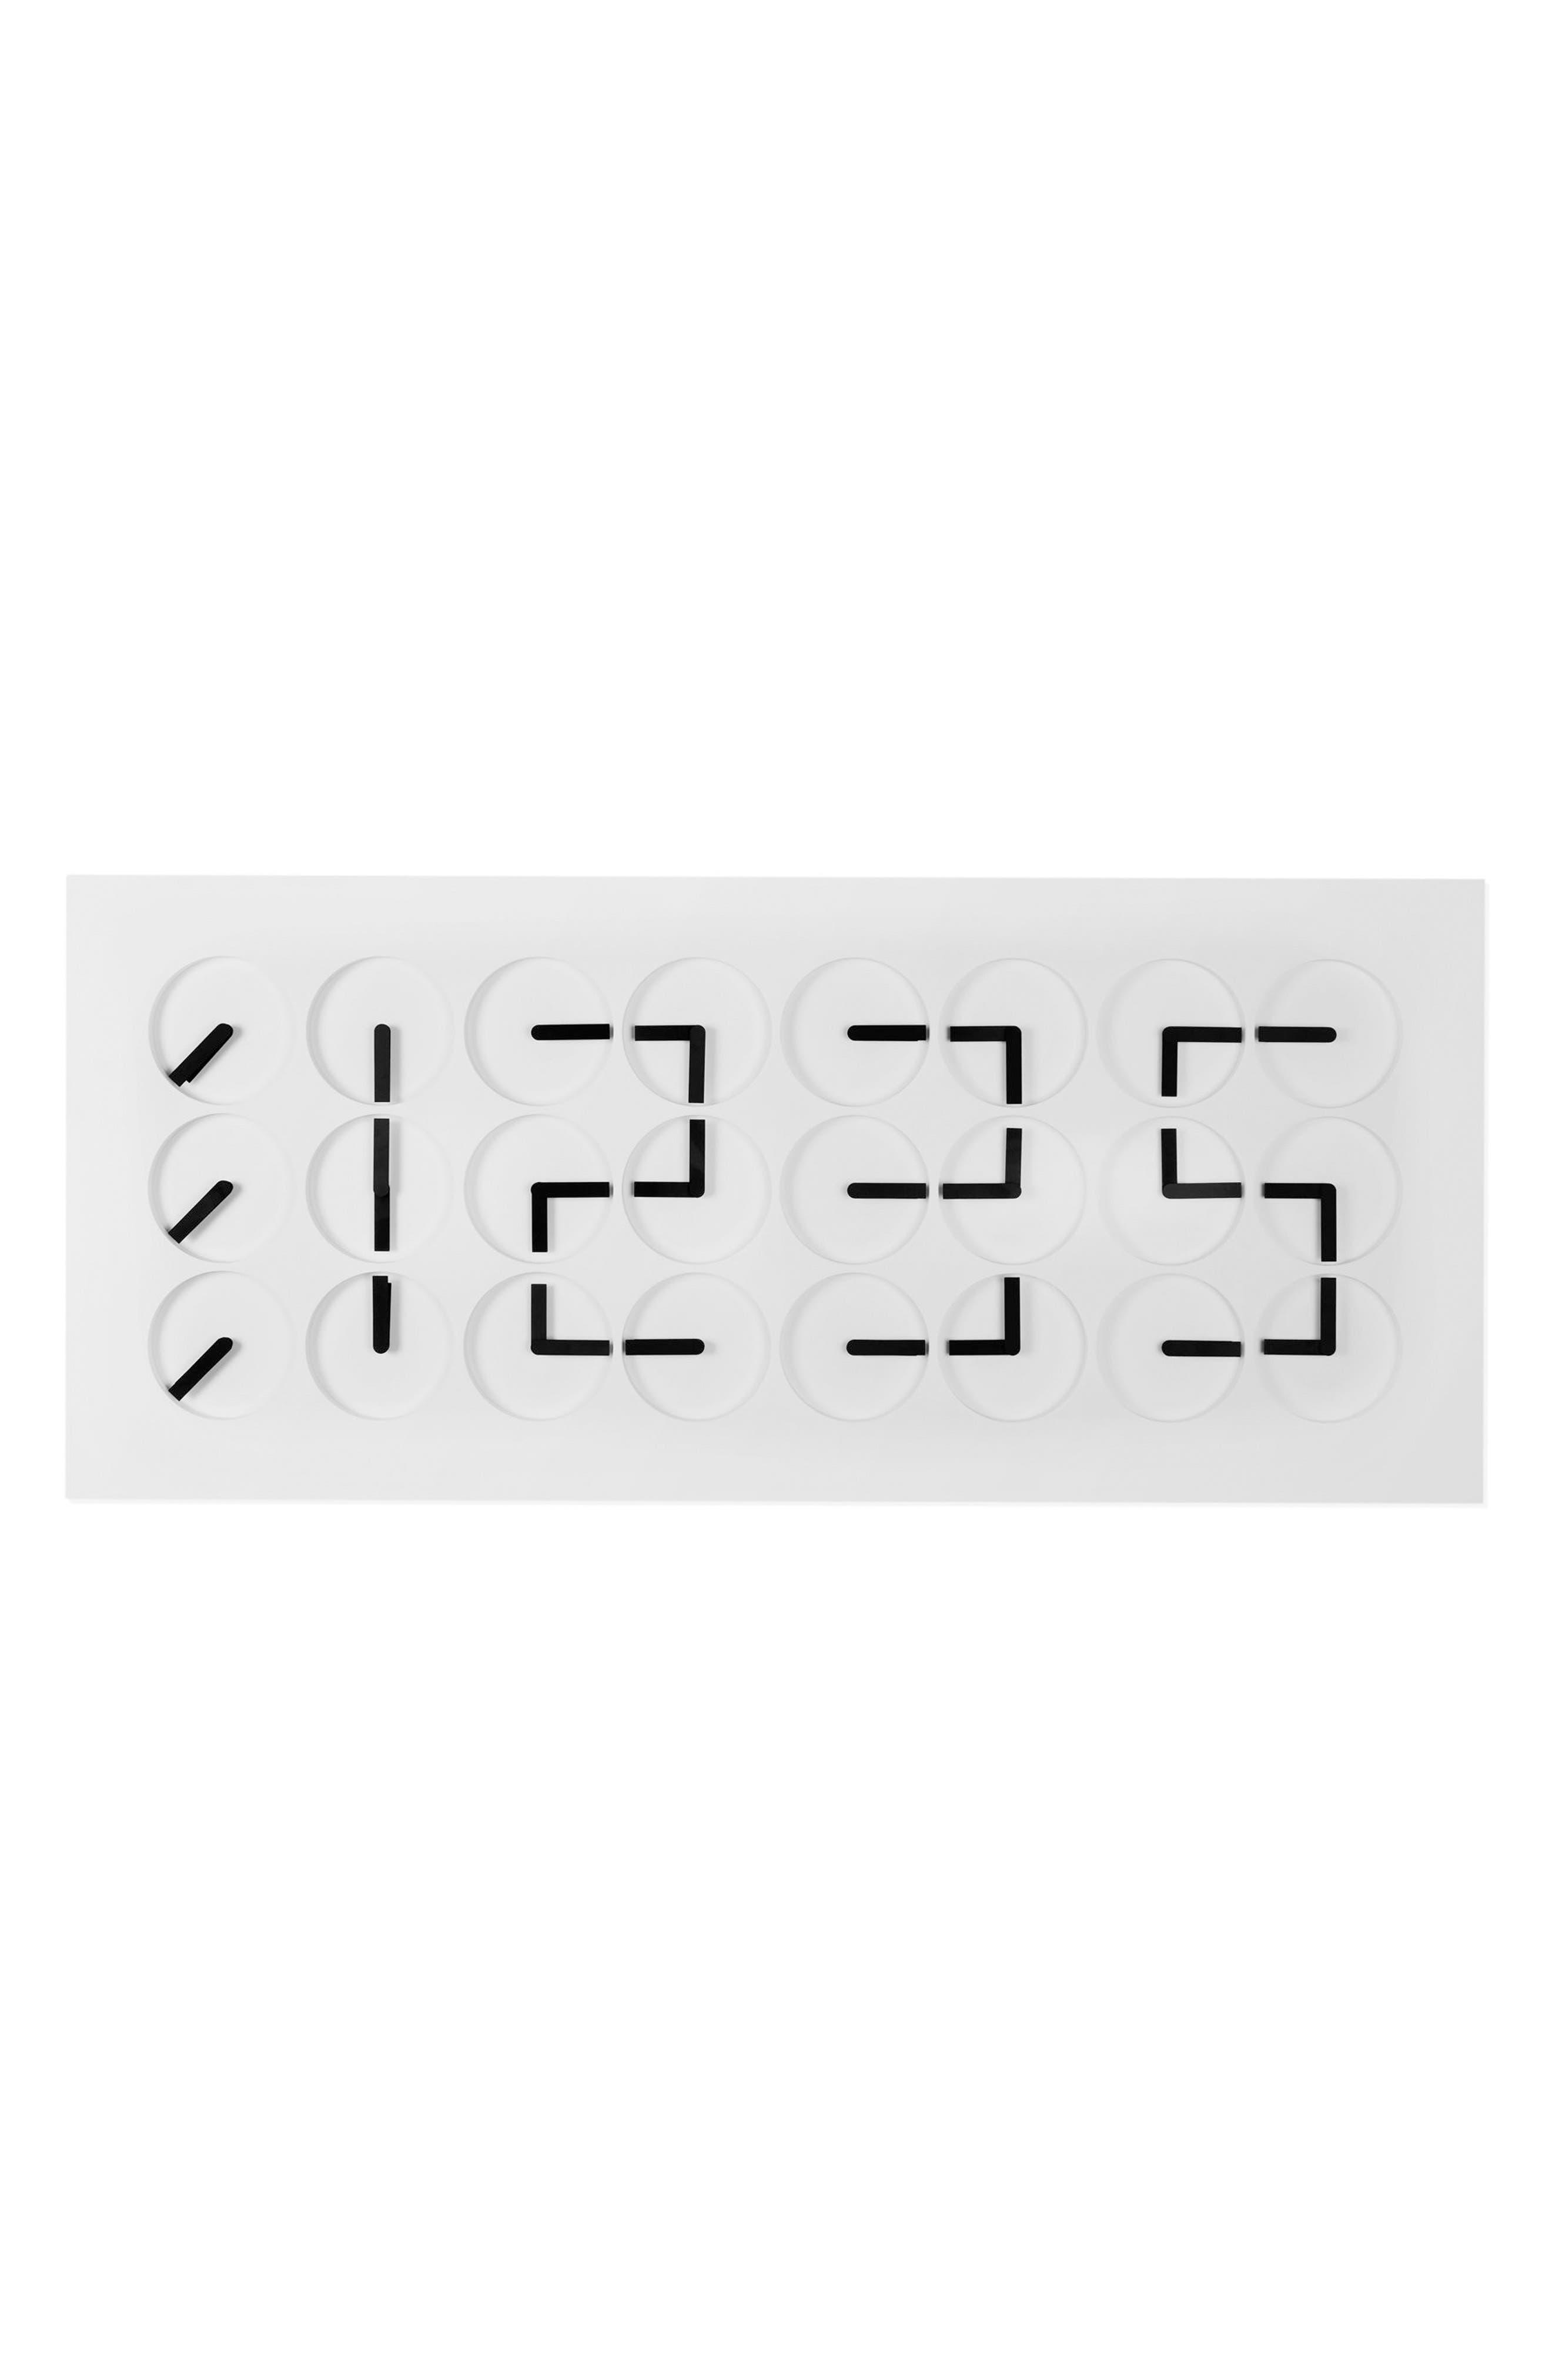 ClockClock 24 Digital Clock,                         Main,                         color, White